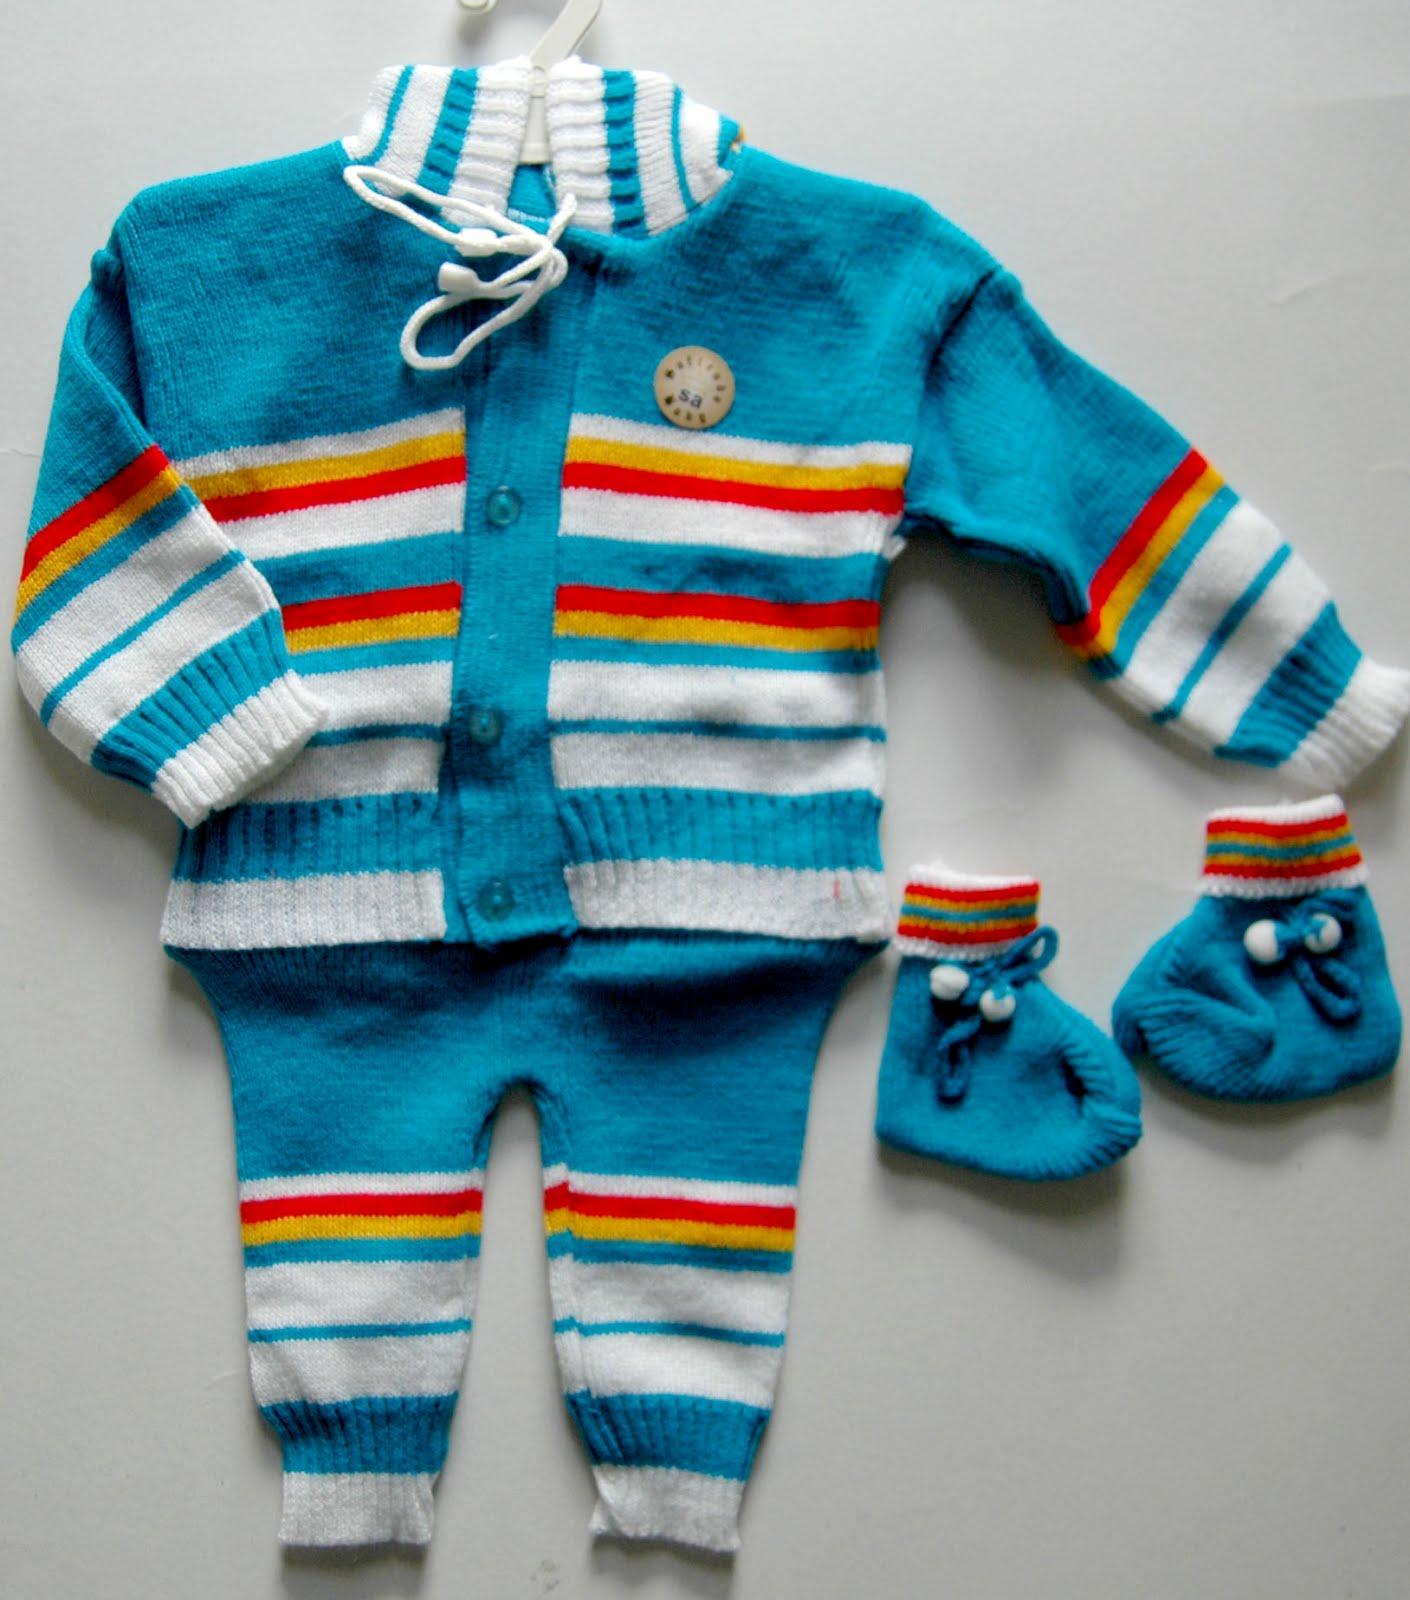 Grosir Baju Bayi Murah, Pakaian Bayi Murah, Perlengkapan Bayi Bandung